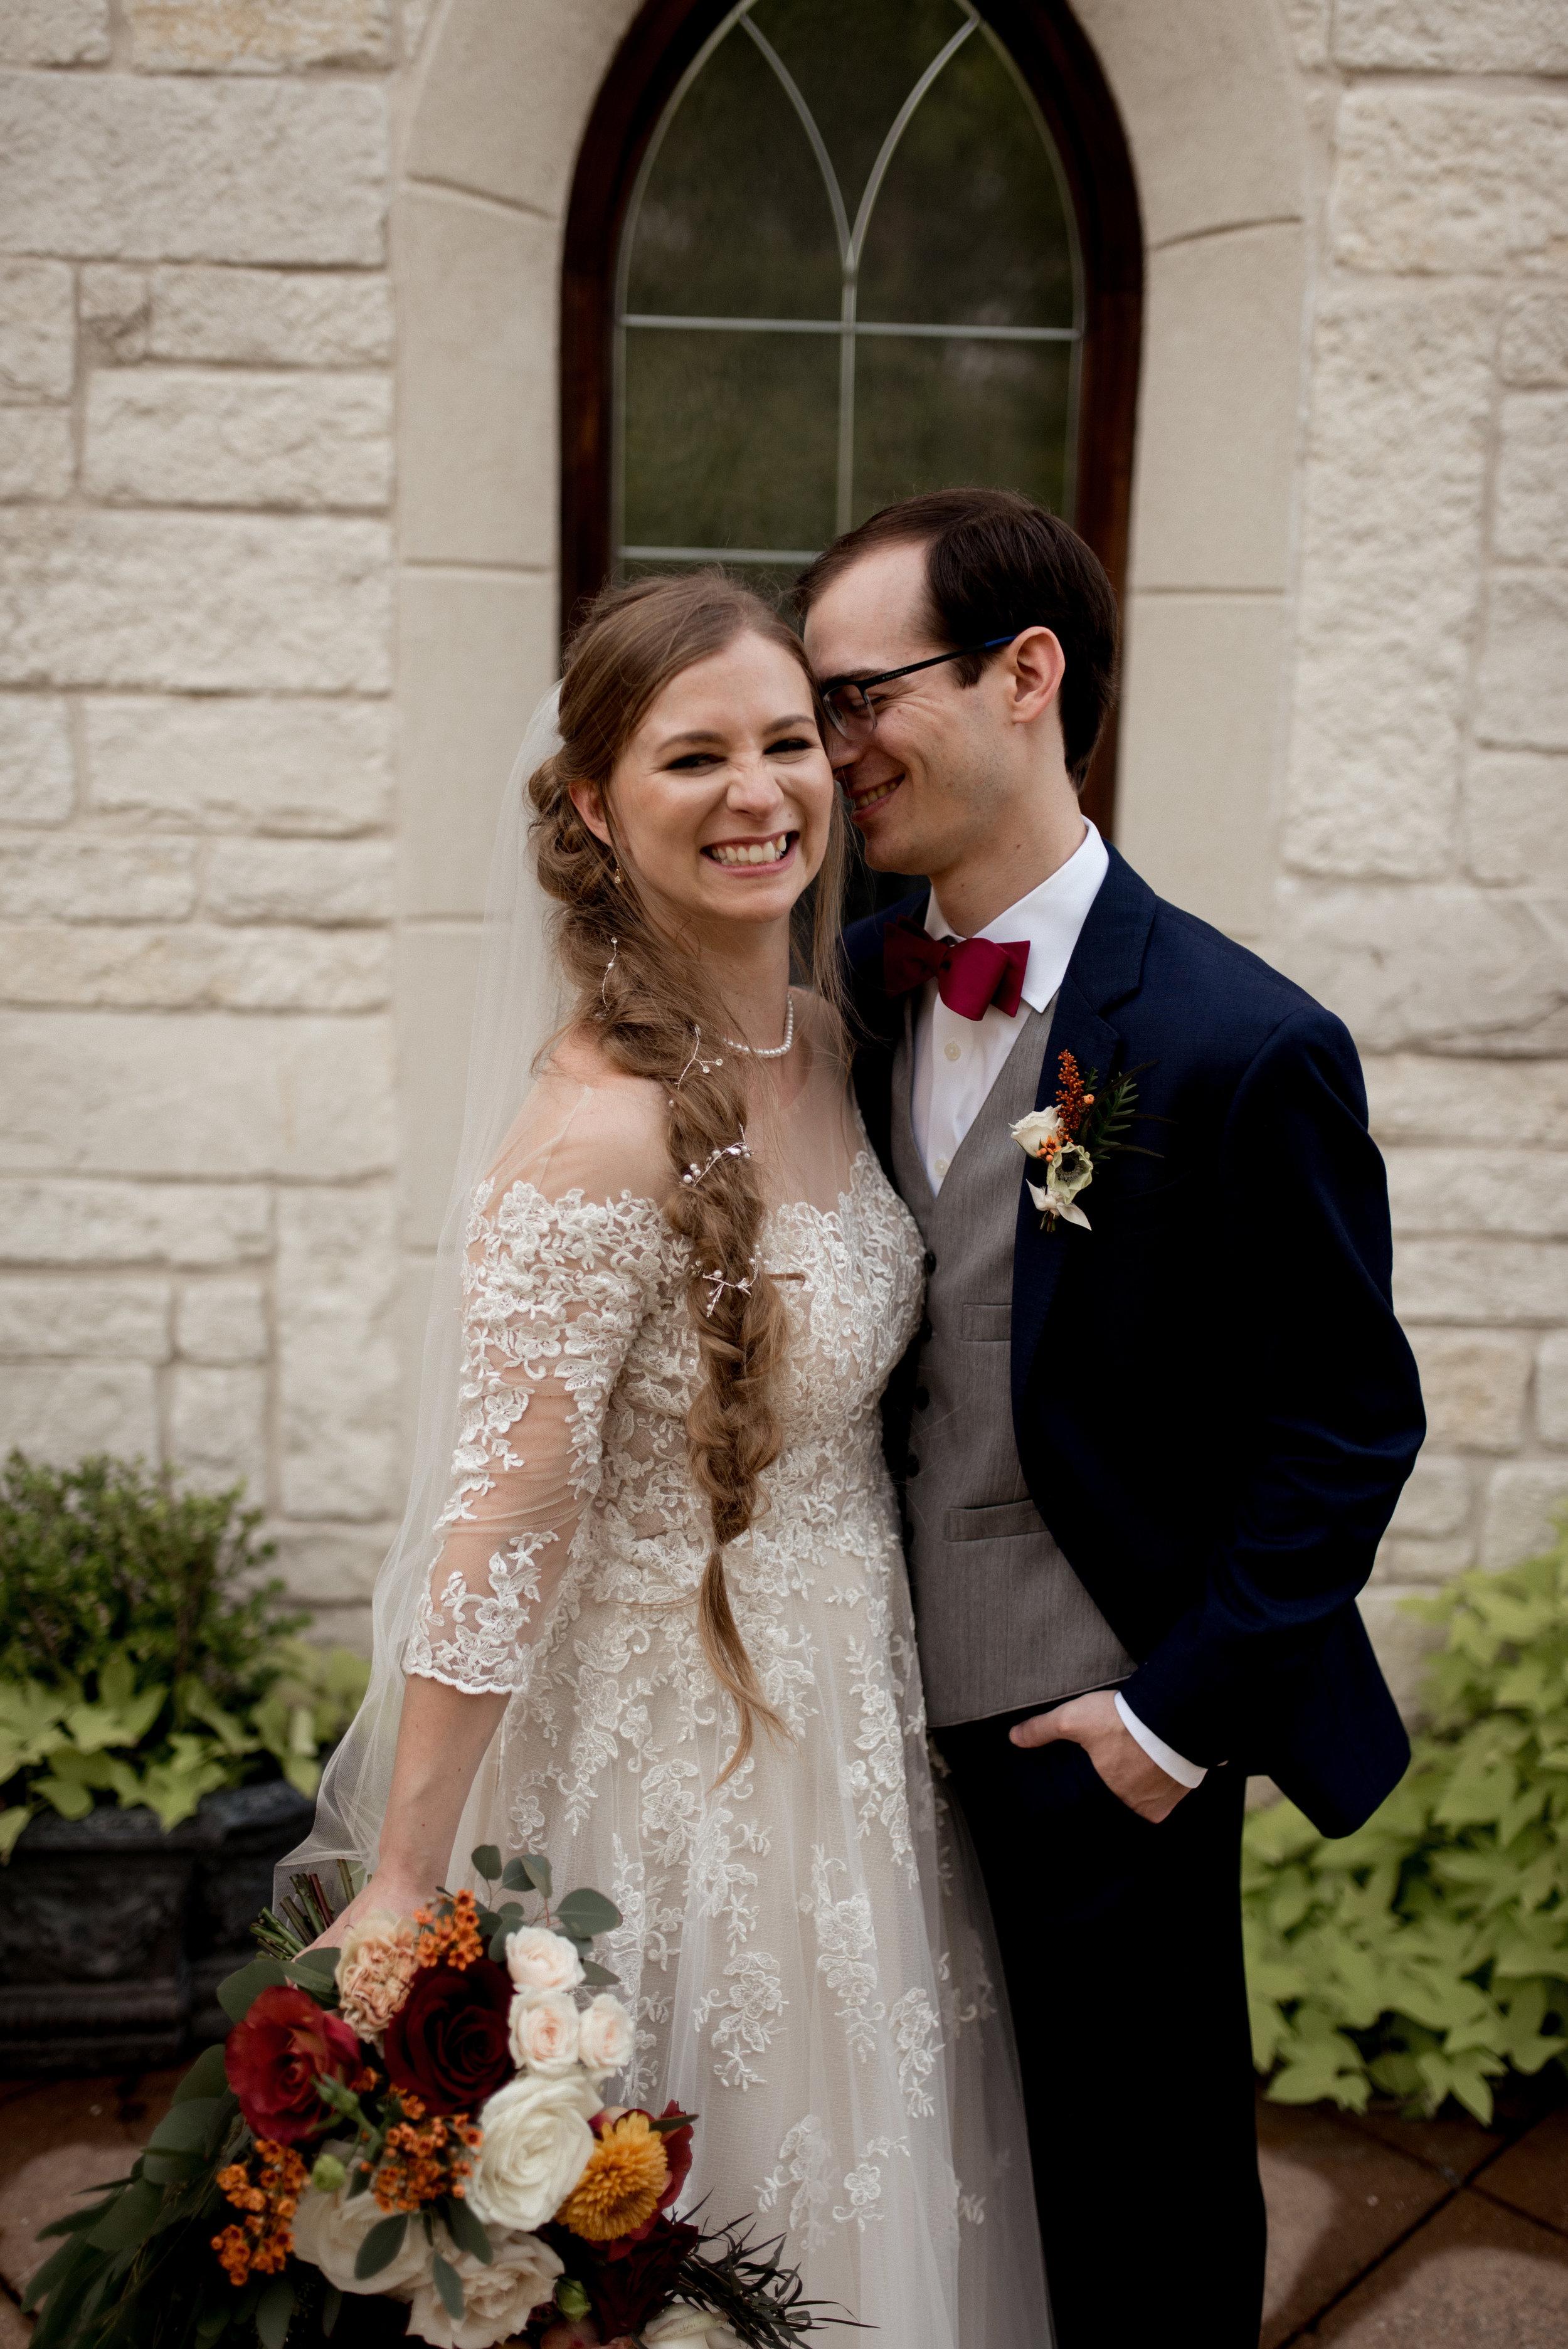 Artigues Wedding-257.jpg